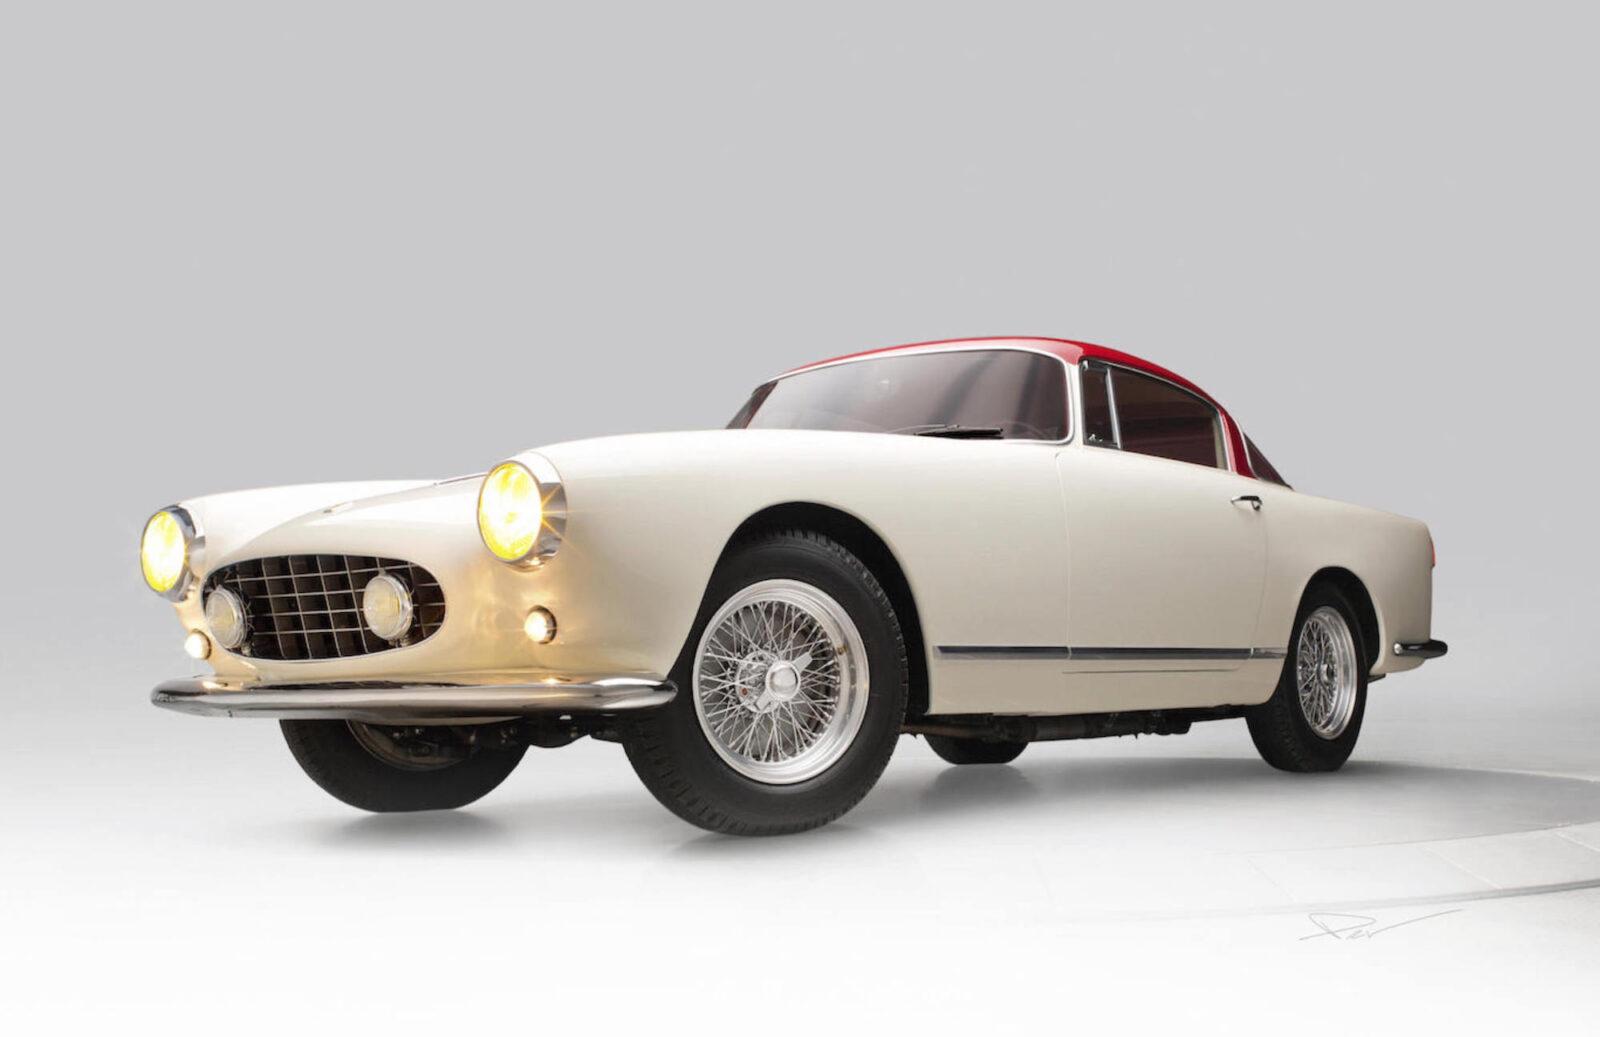 Ferrari 250GT Alloy 1 1600x1037 - Ferrari 250 GT Alloy Boano